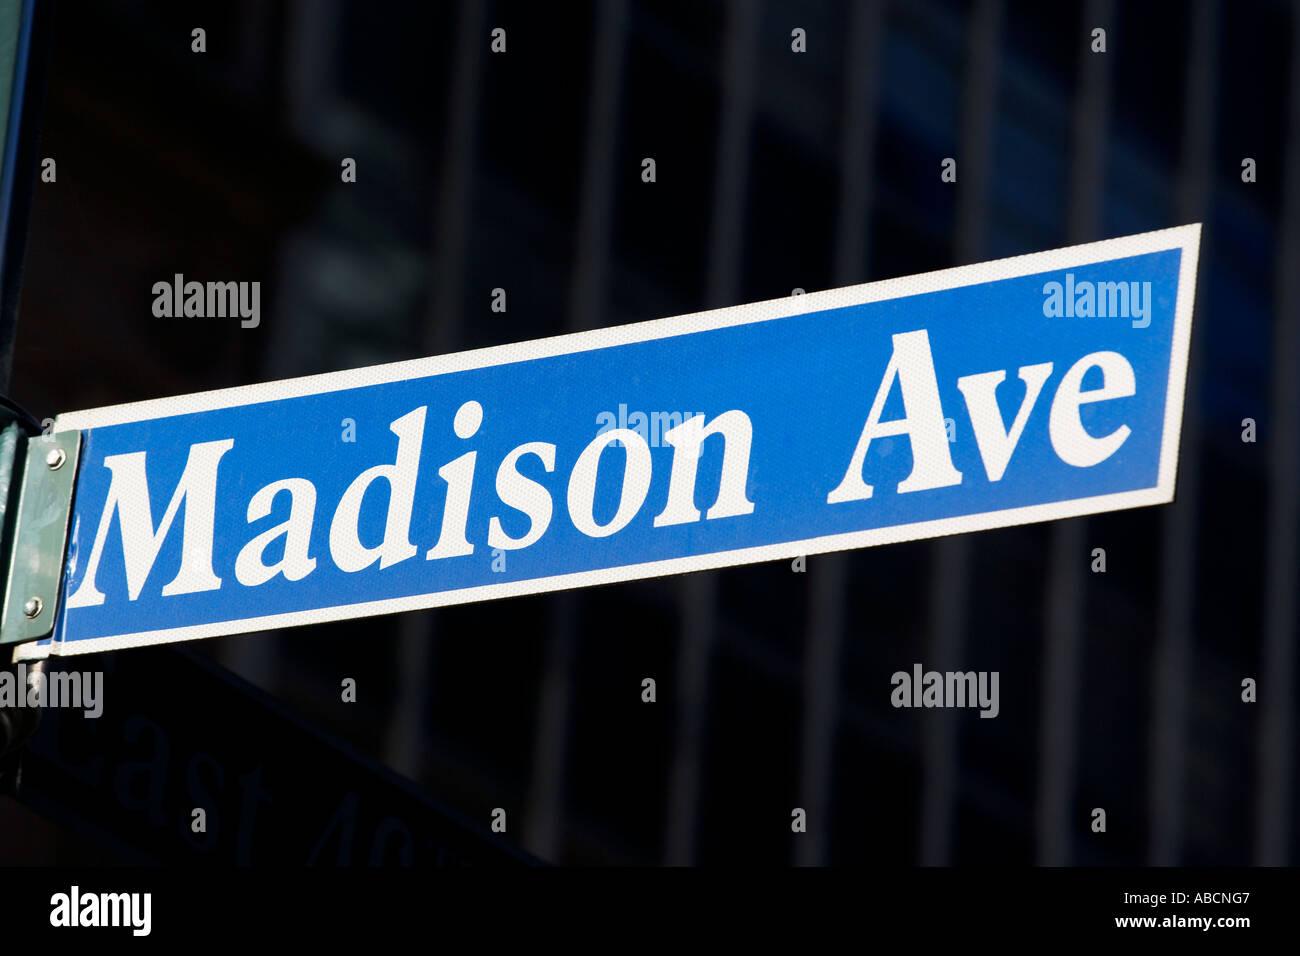 Madison avenue street sign - Stock Image